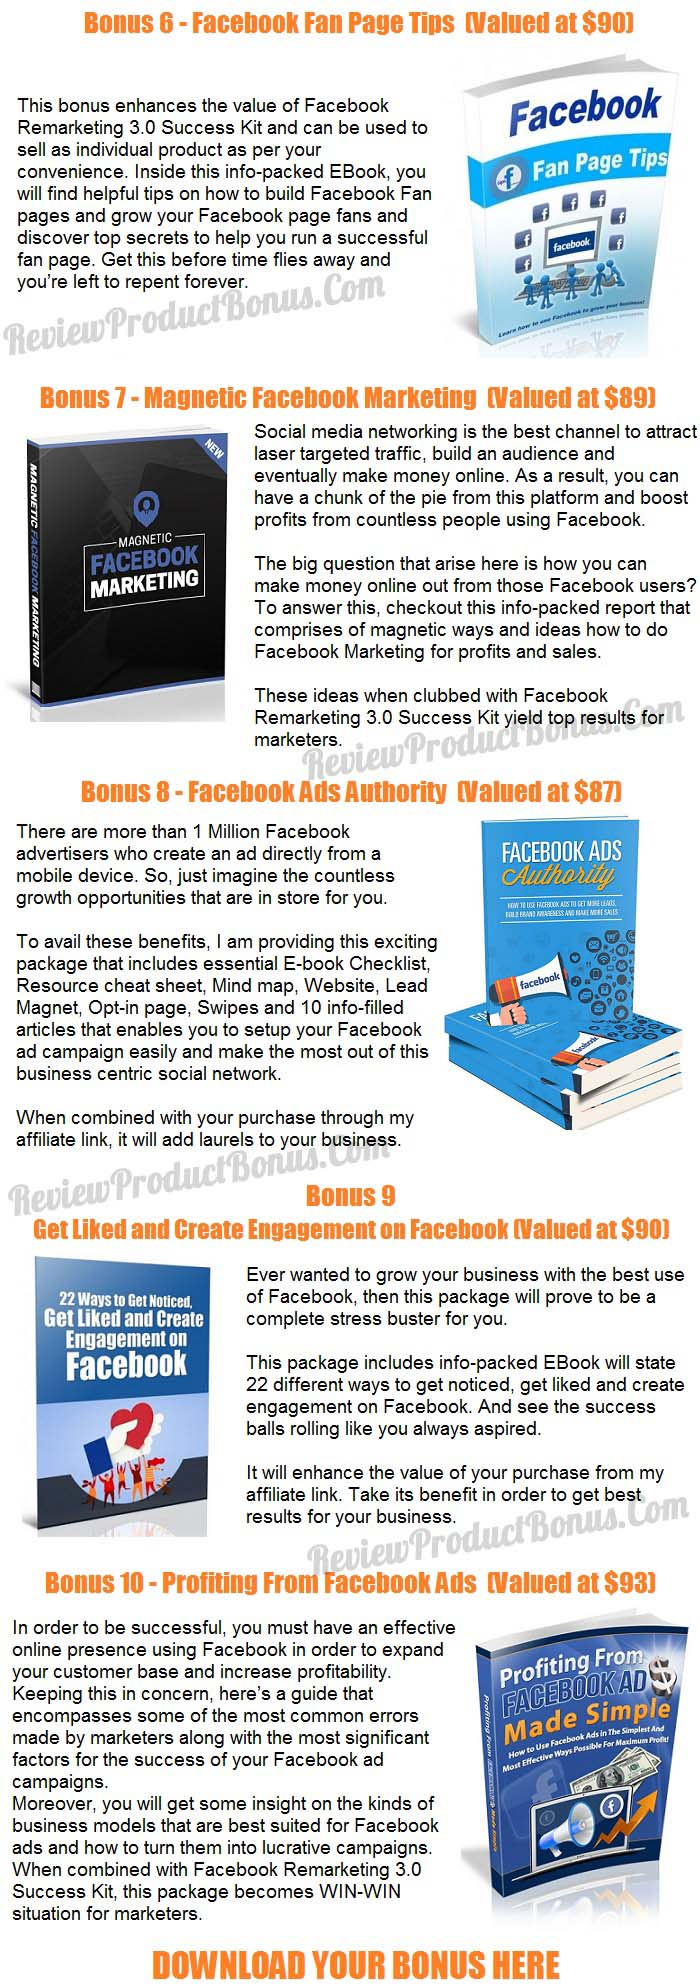 Facebook Remarketing 3.0 Success Kit Bonuses